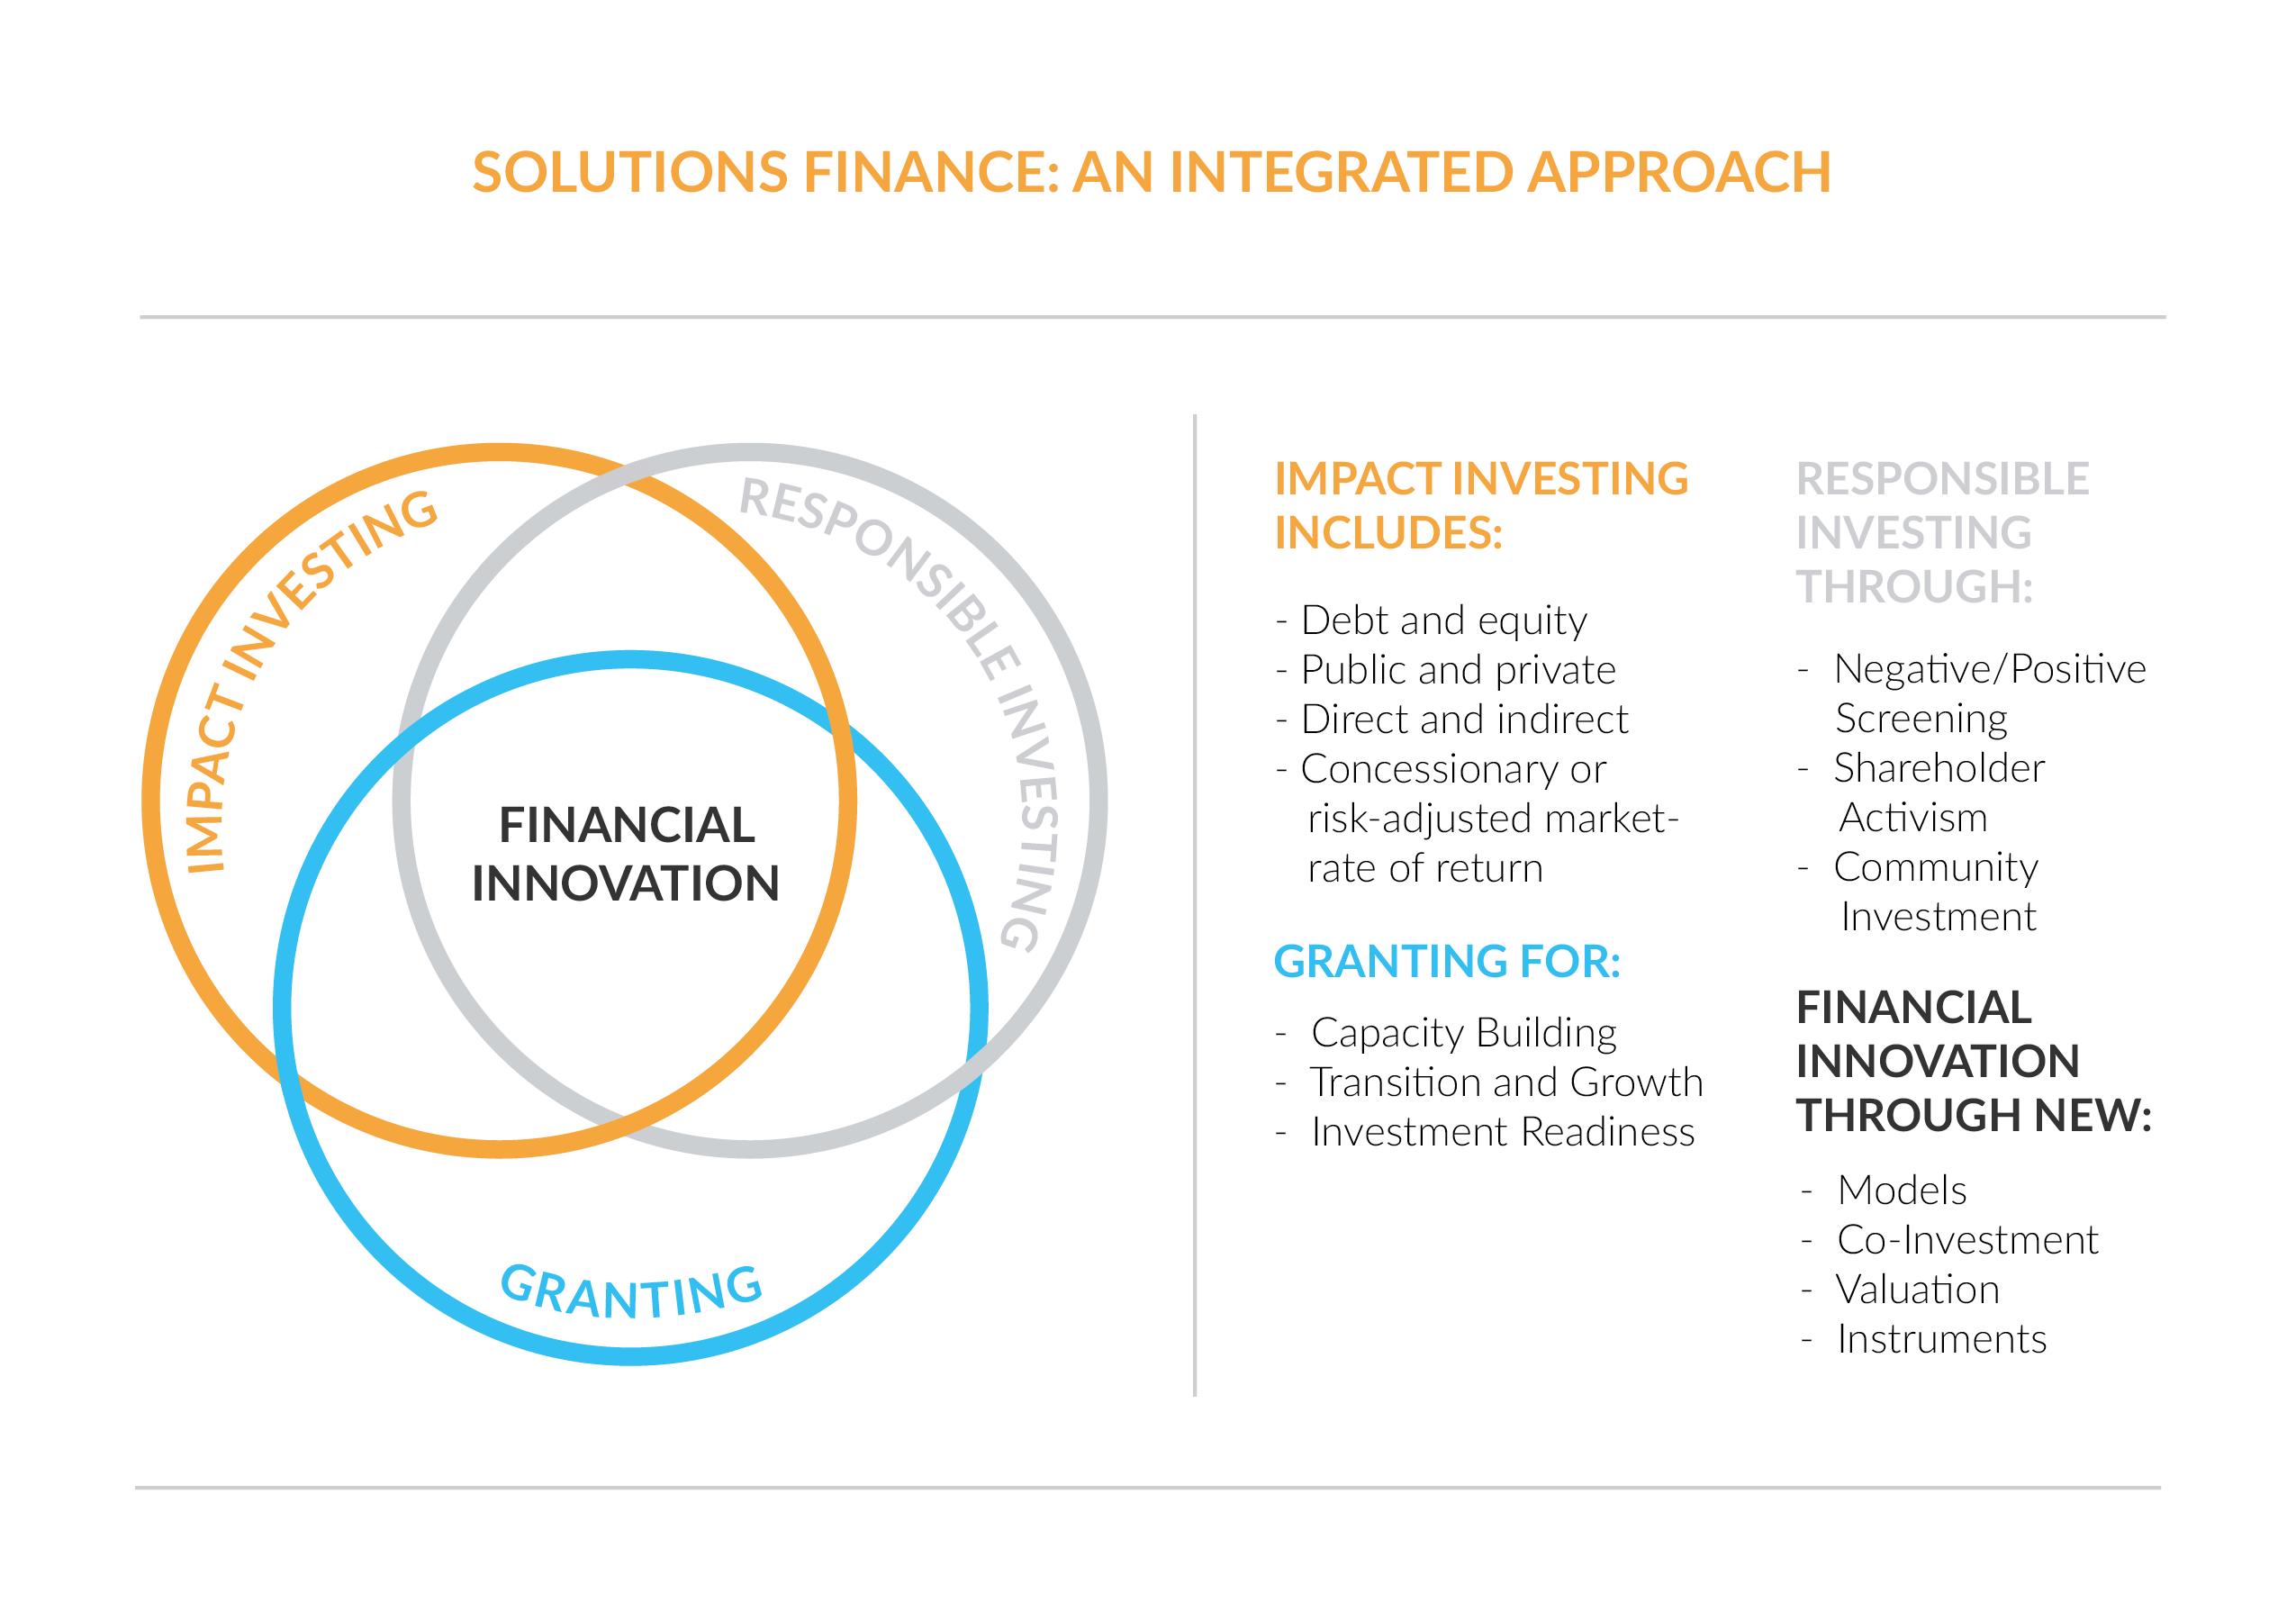 solutionsfinance integ